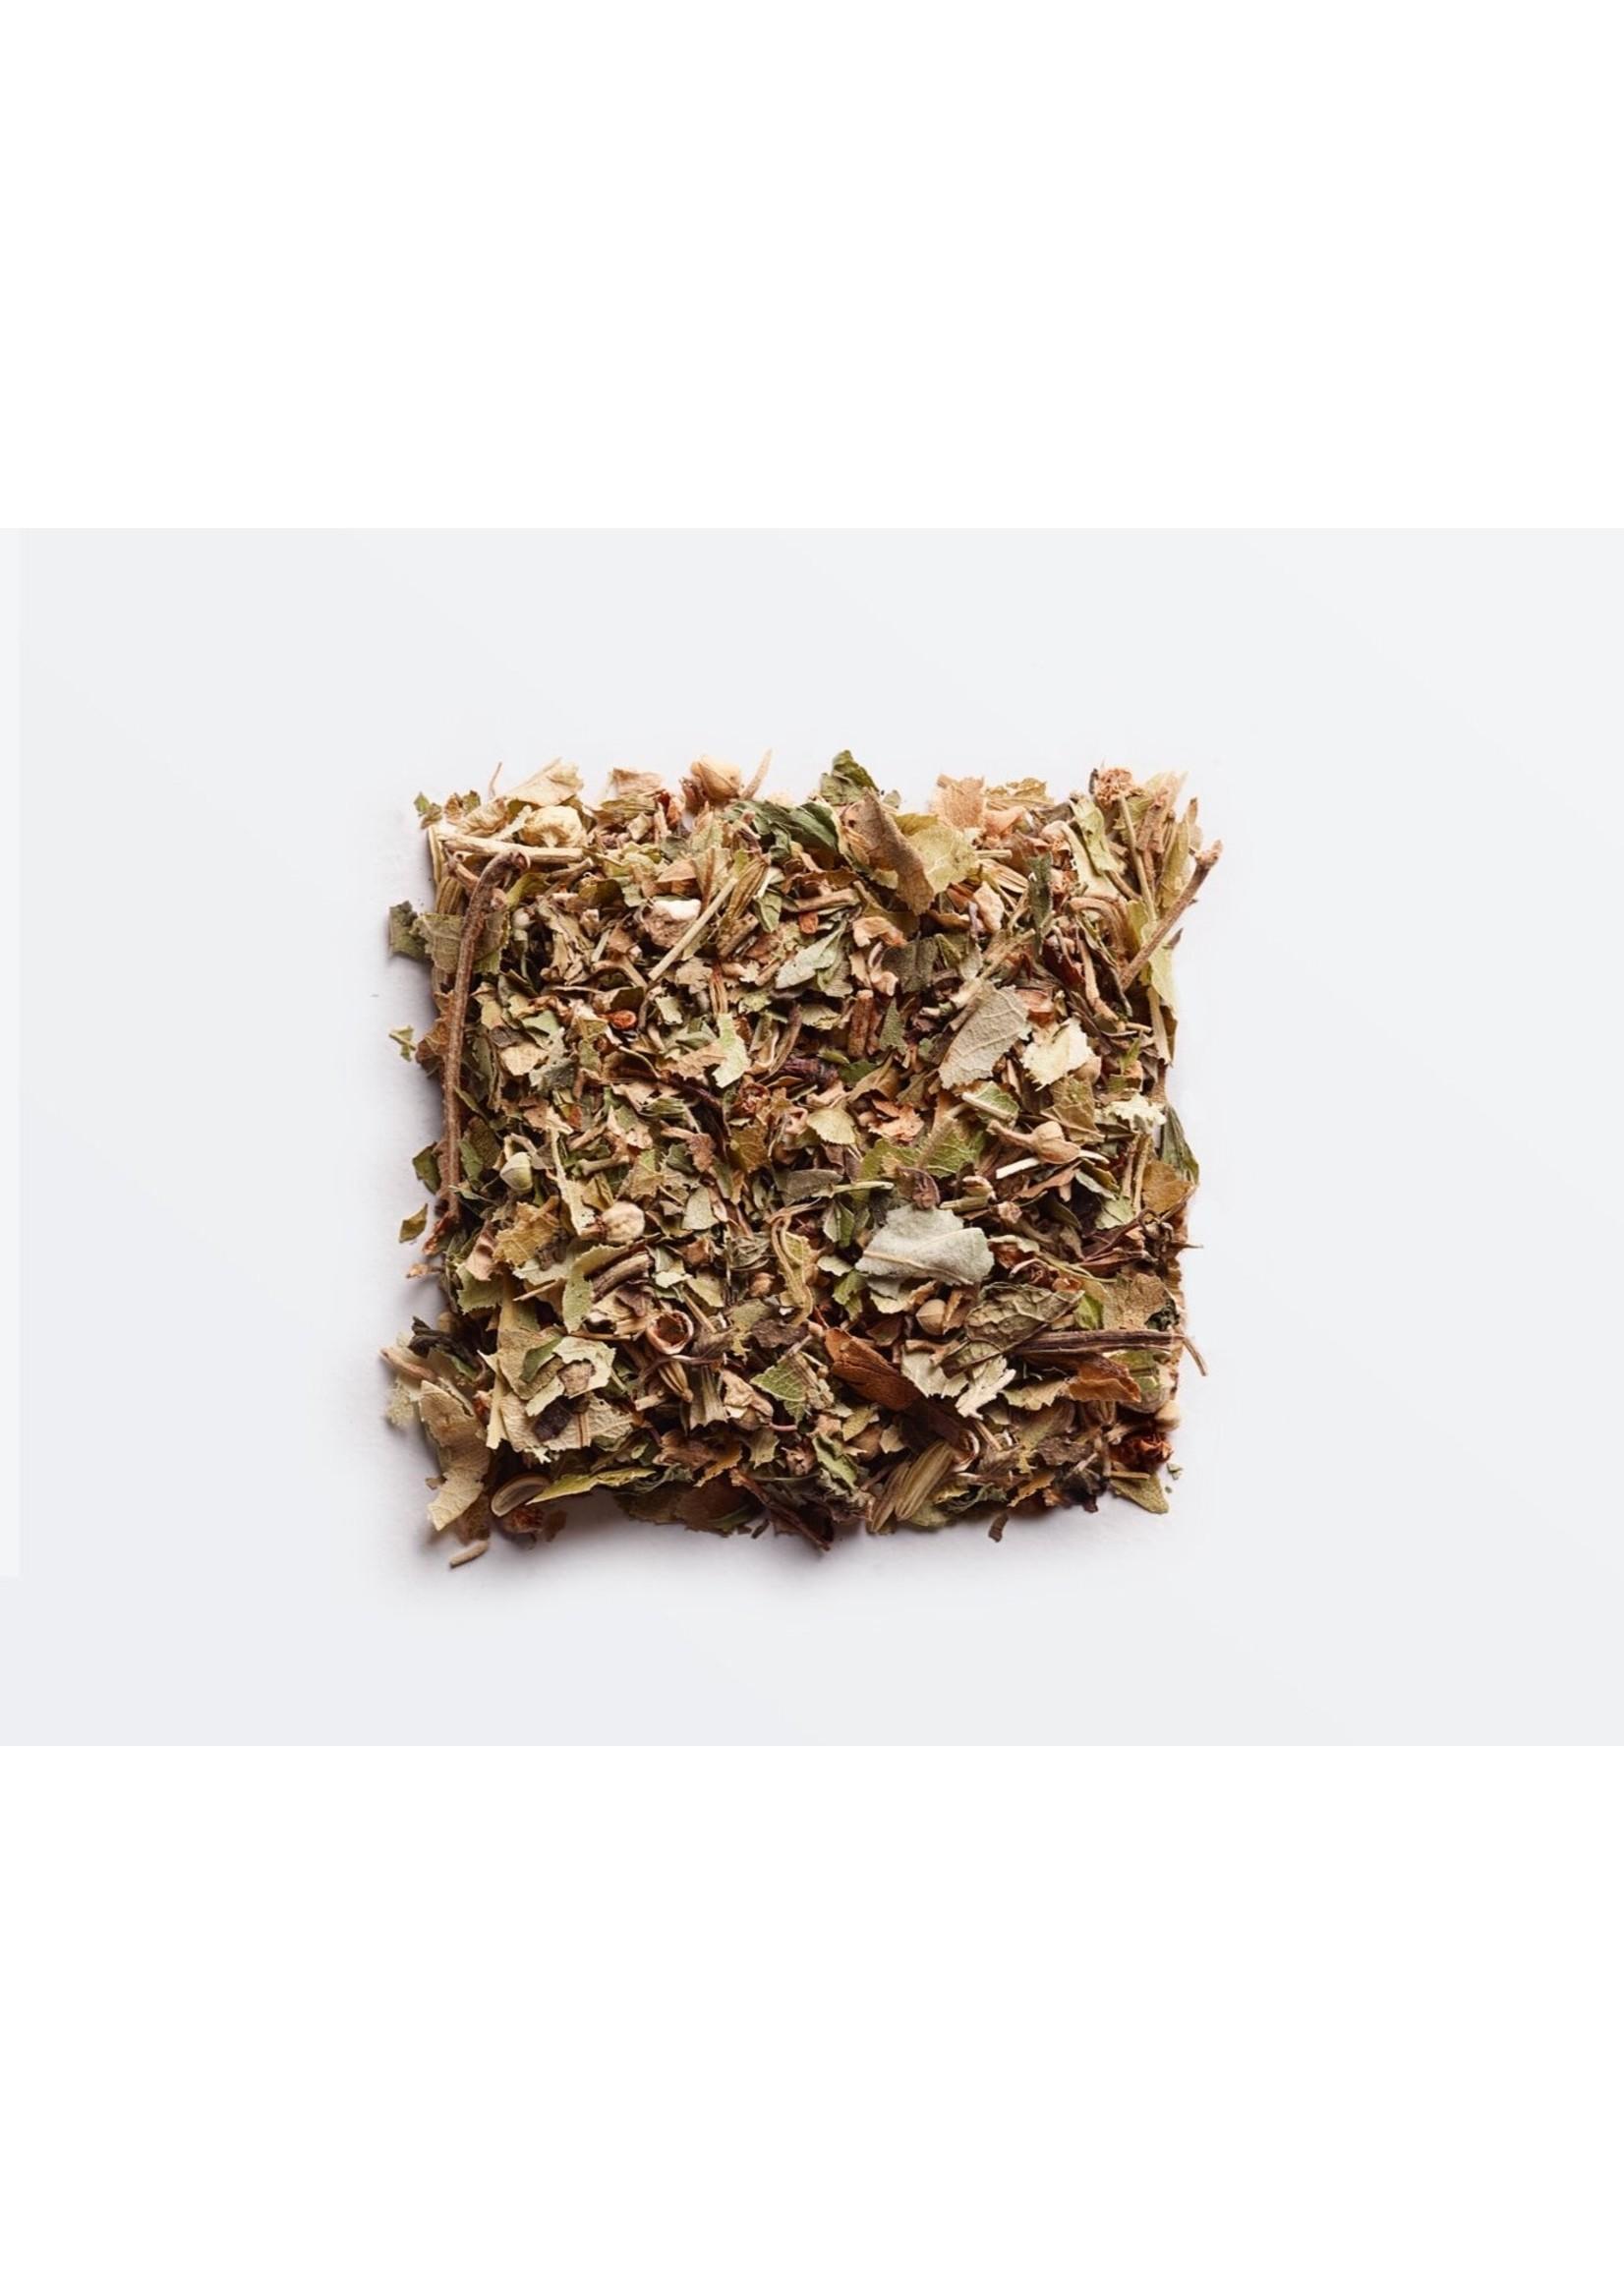 Lab Tonica Lab Tonica Breathe Tea